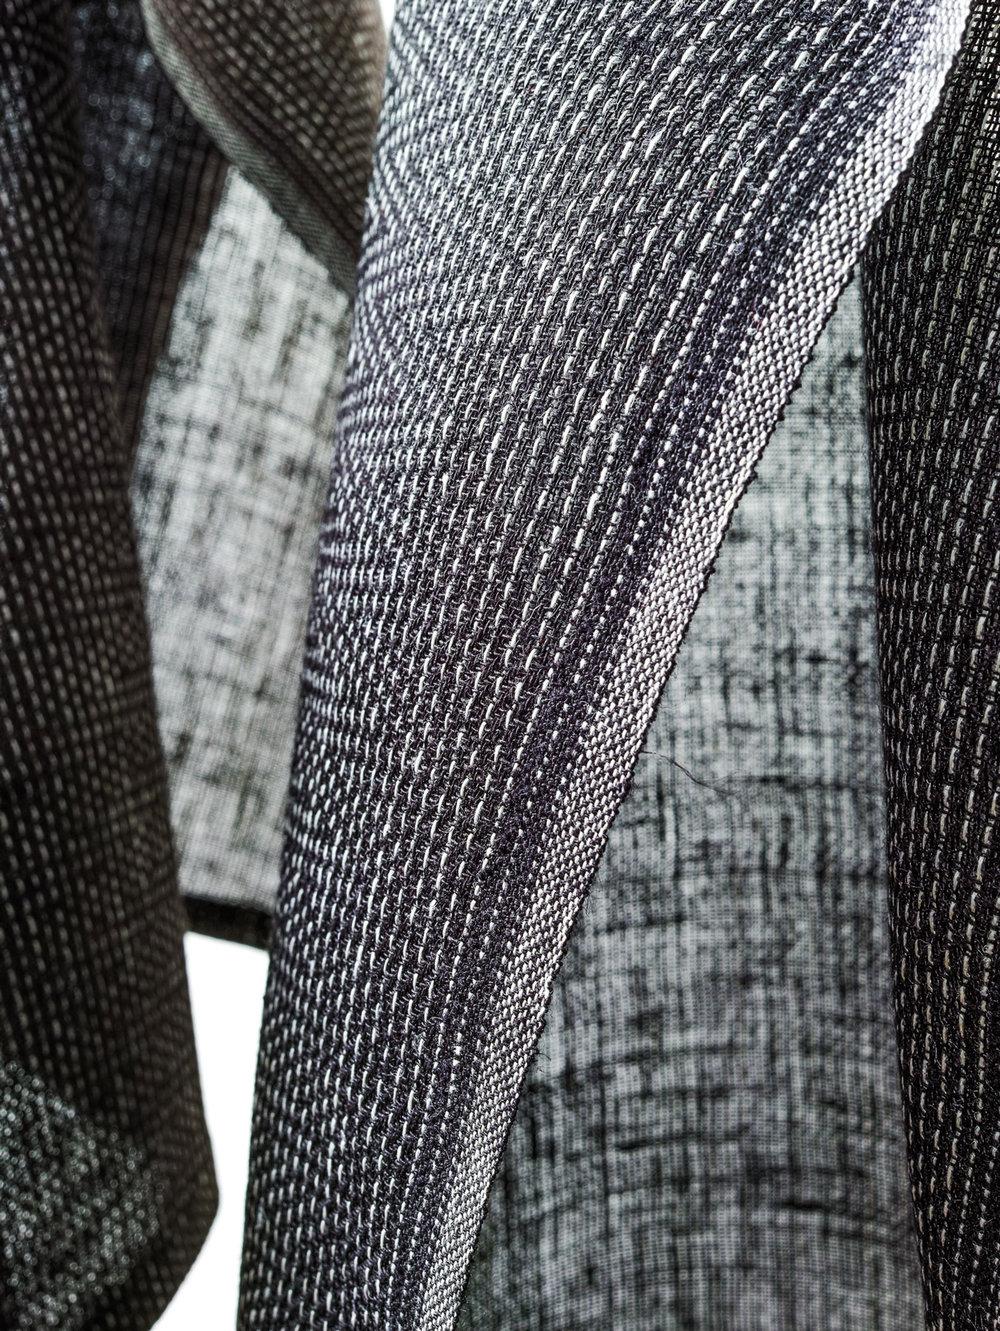 TextileNo-KCarlander-hanging3-photoJeffHargrove.jpg